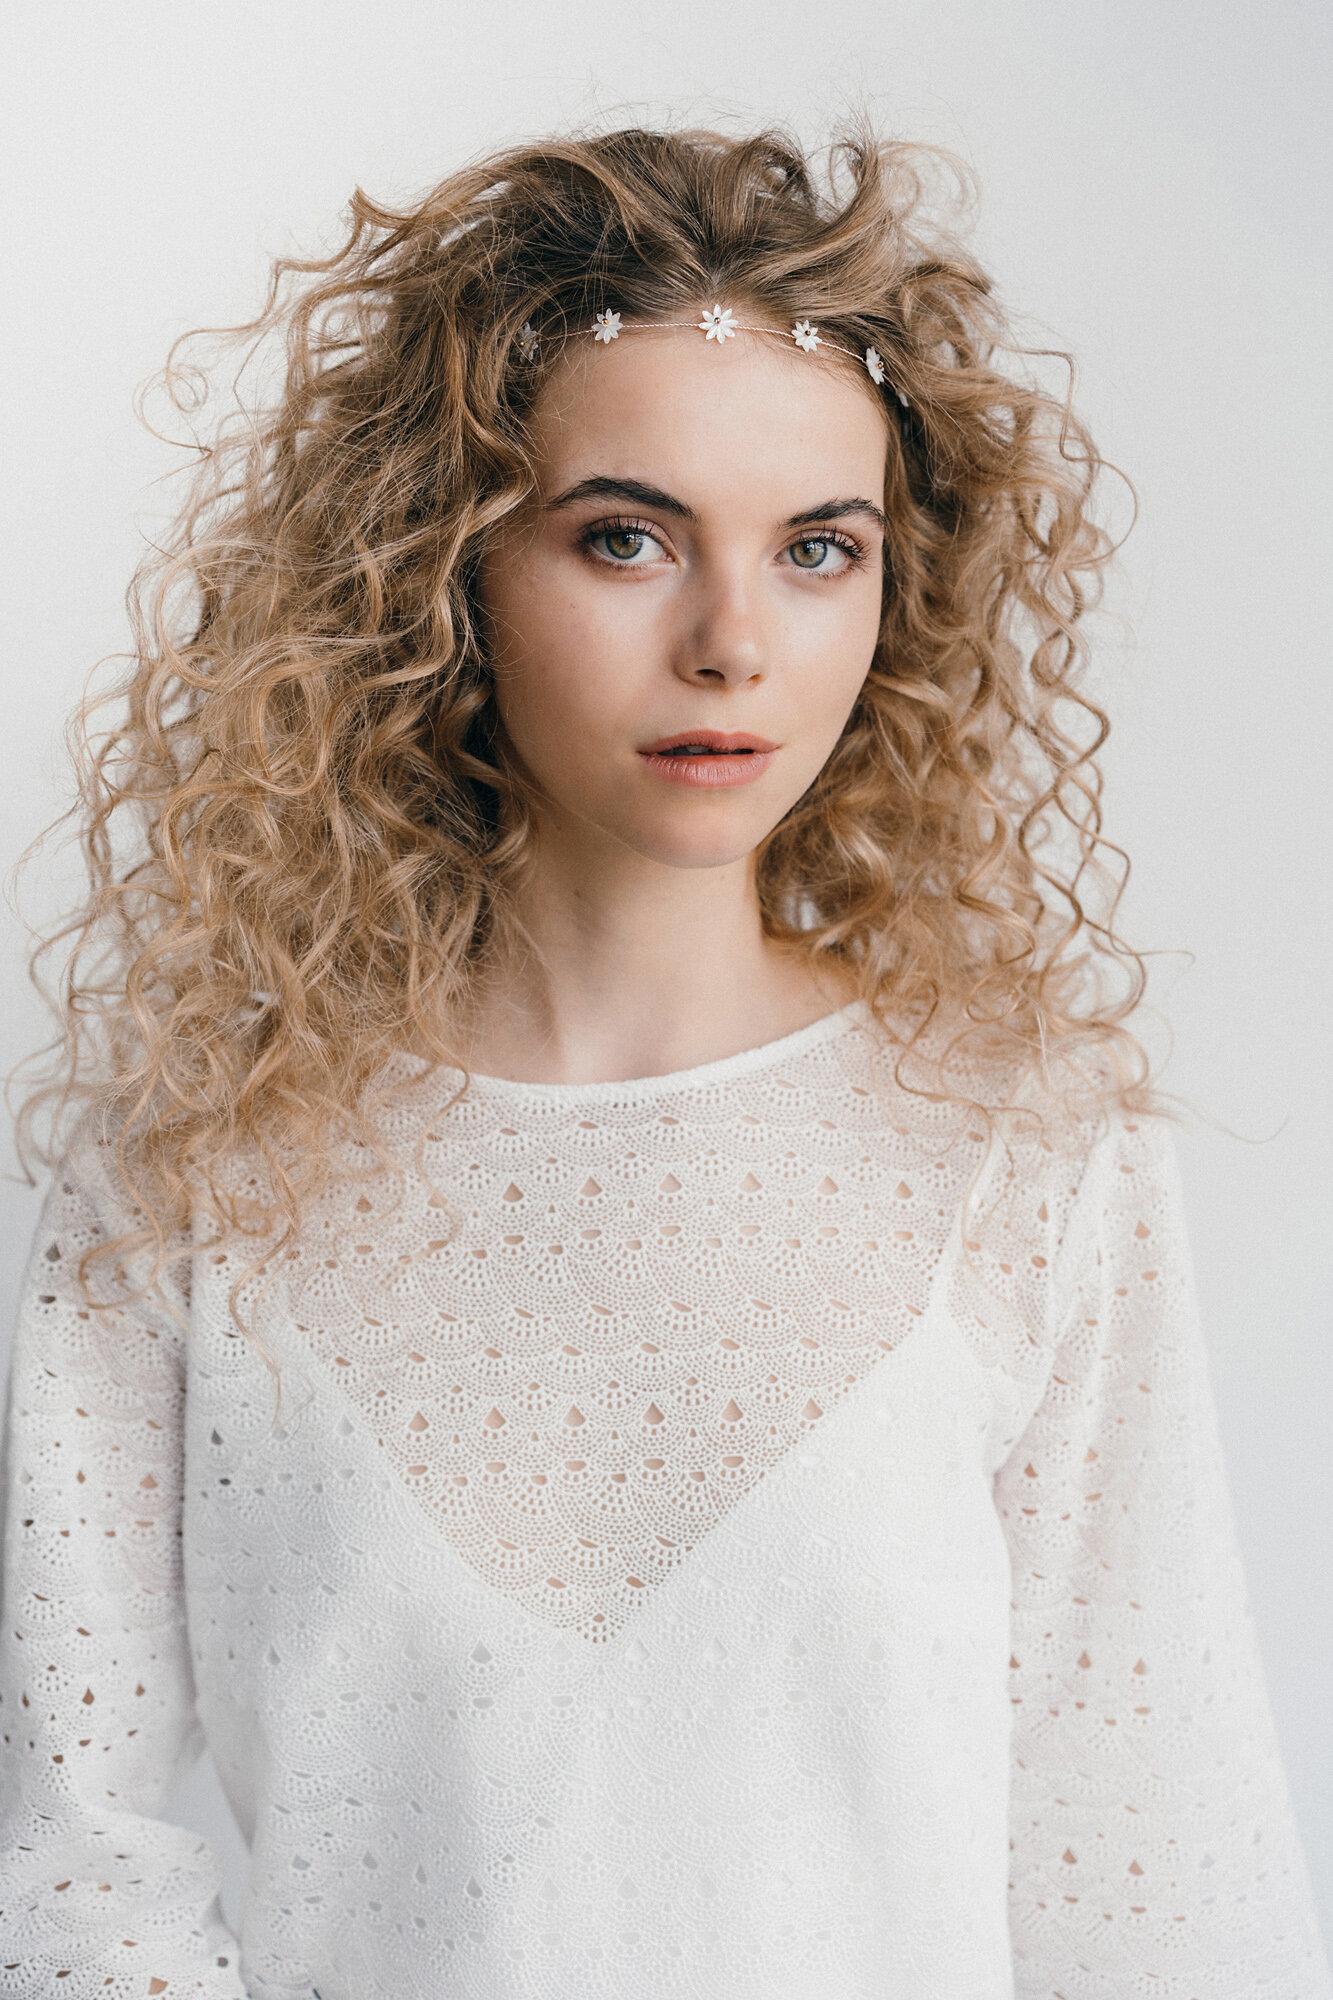 Debbie-Carlisle-Bridal-Accessories-Kate-Beaumont-Wedding-Gowns-Sheffield-Yorkshire-UK-40.jpg